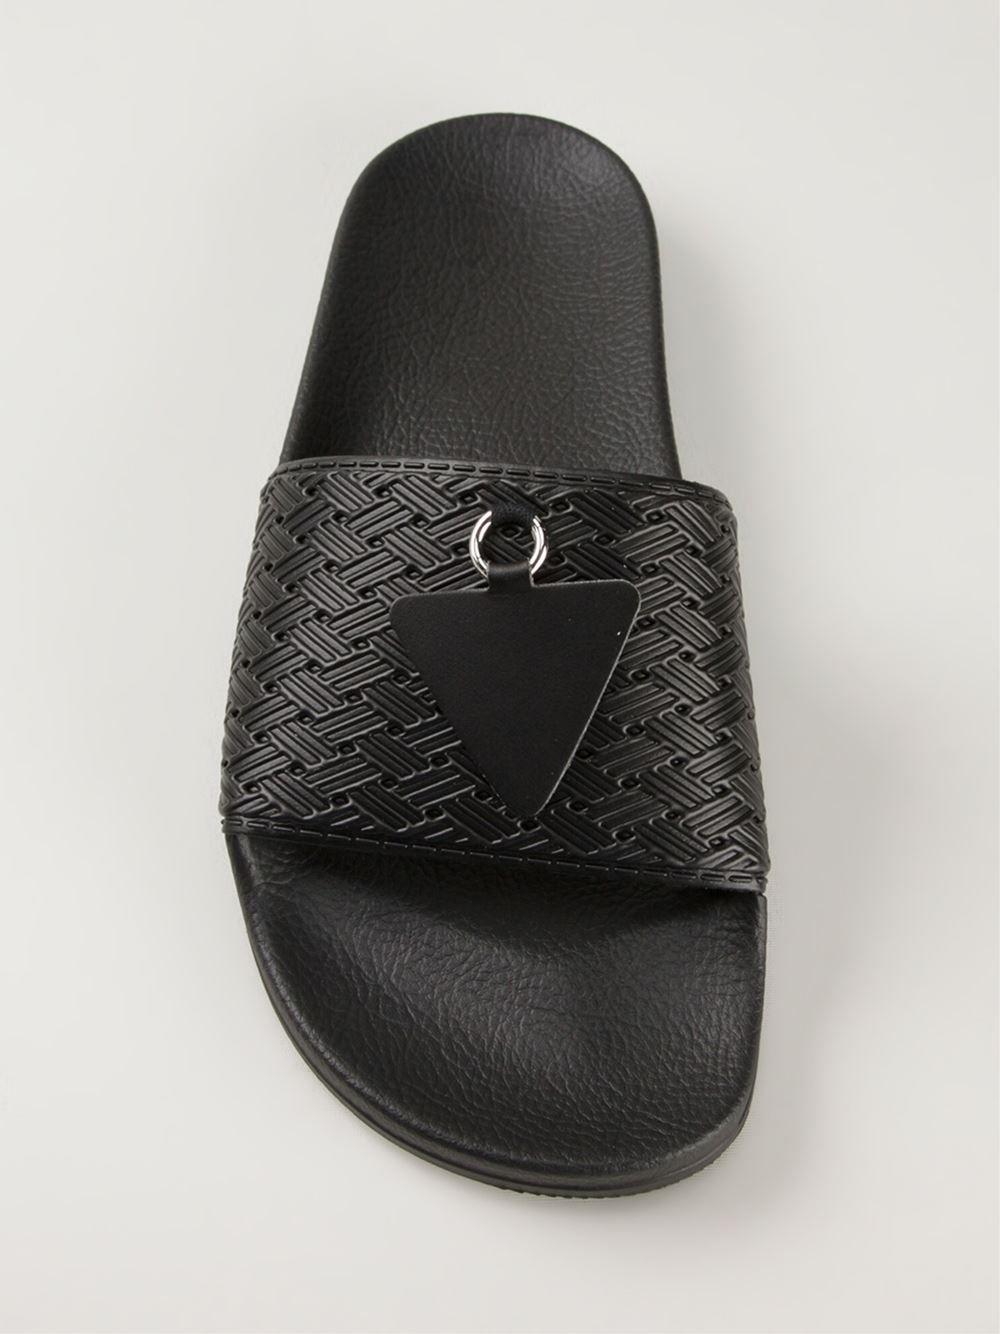 Achetez Adidas By Raf Simons sandales